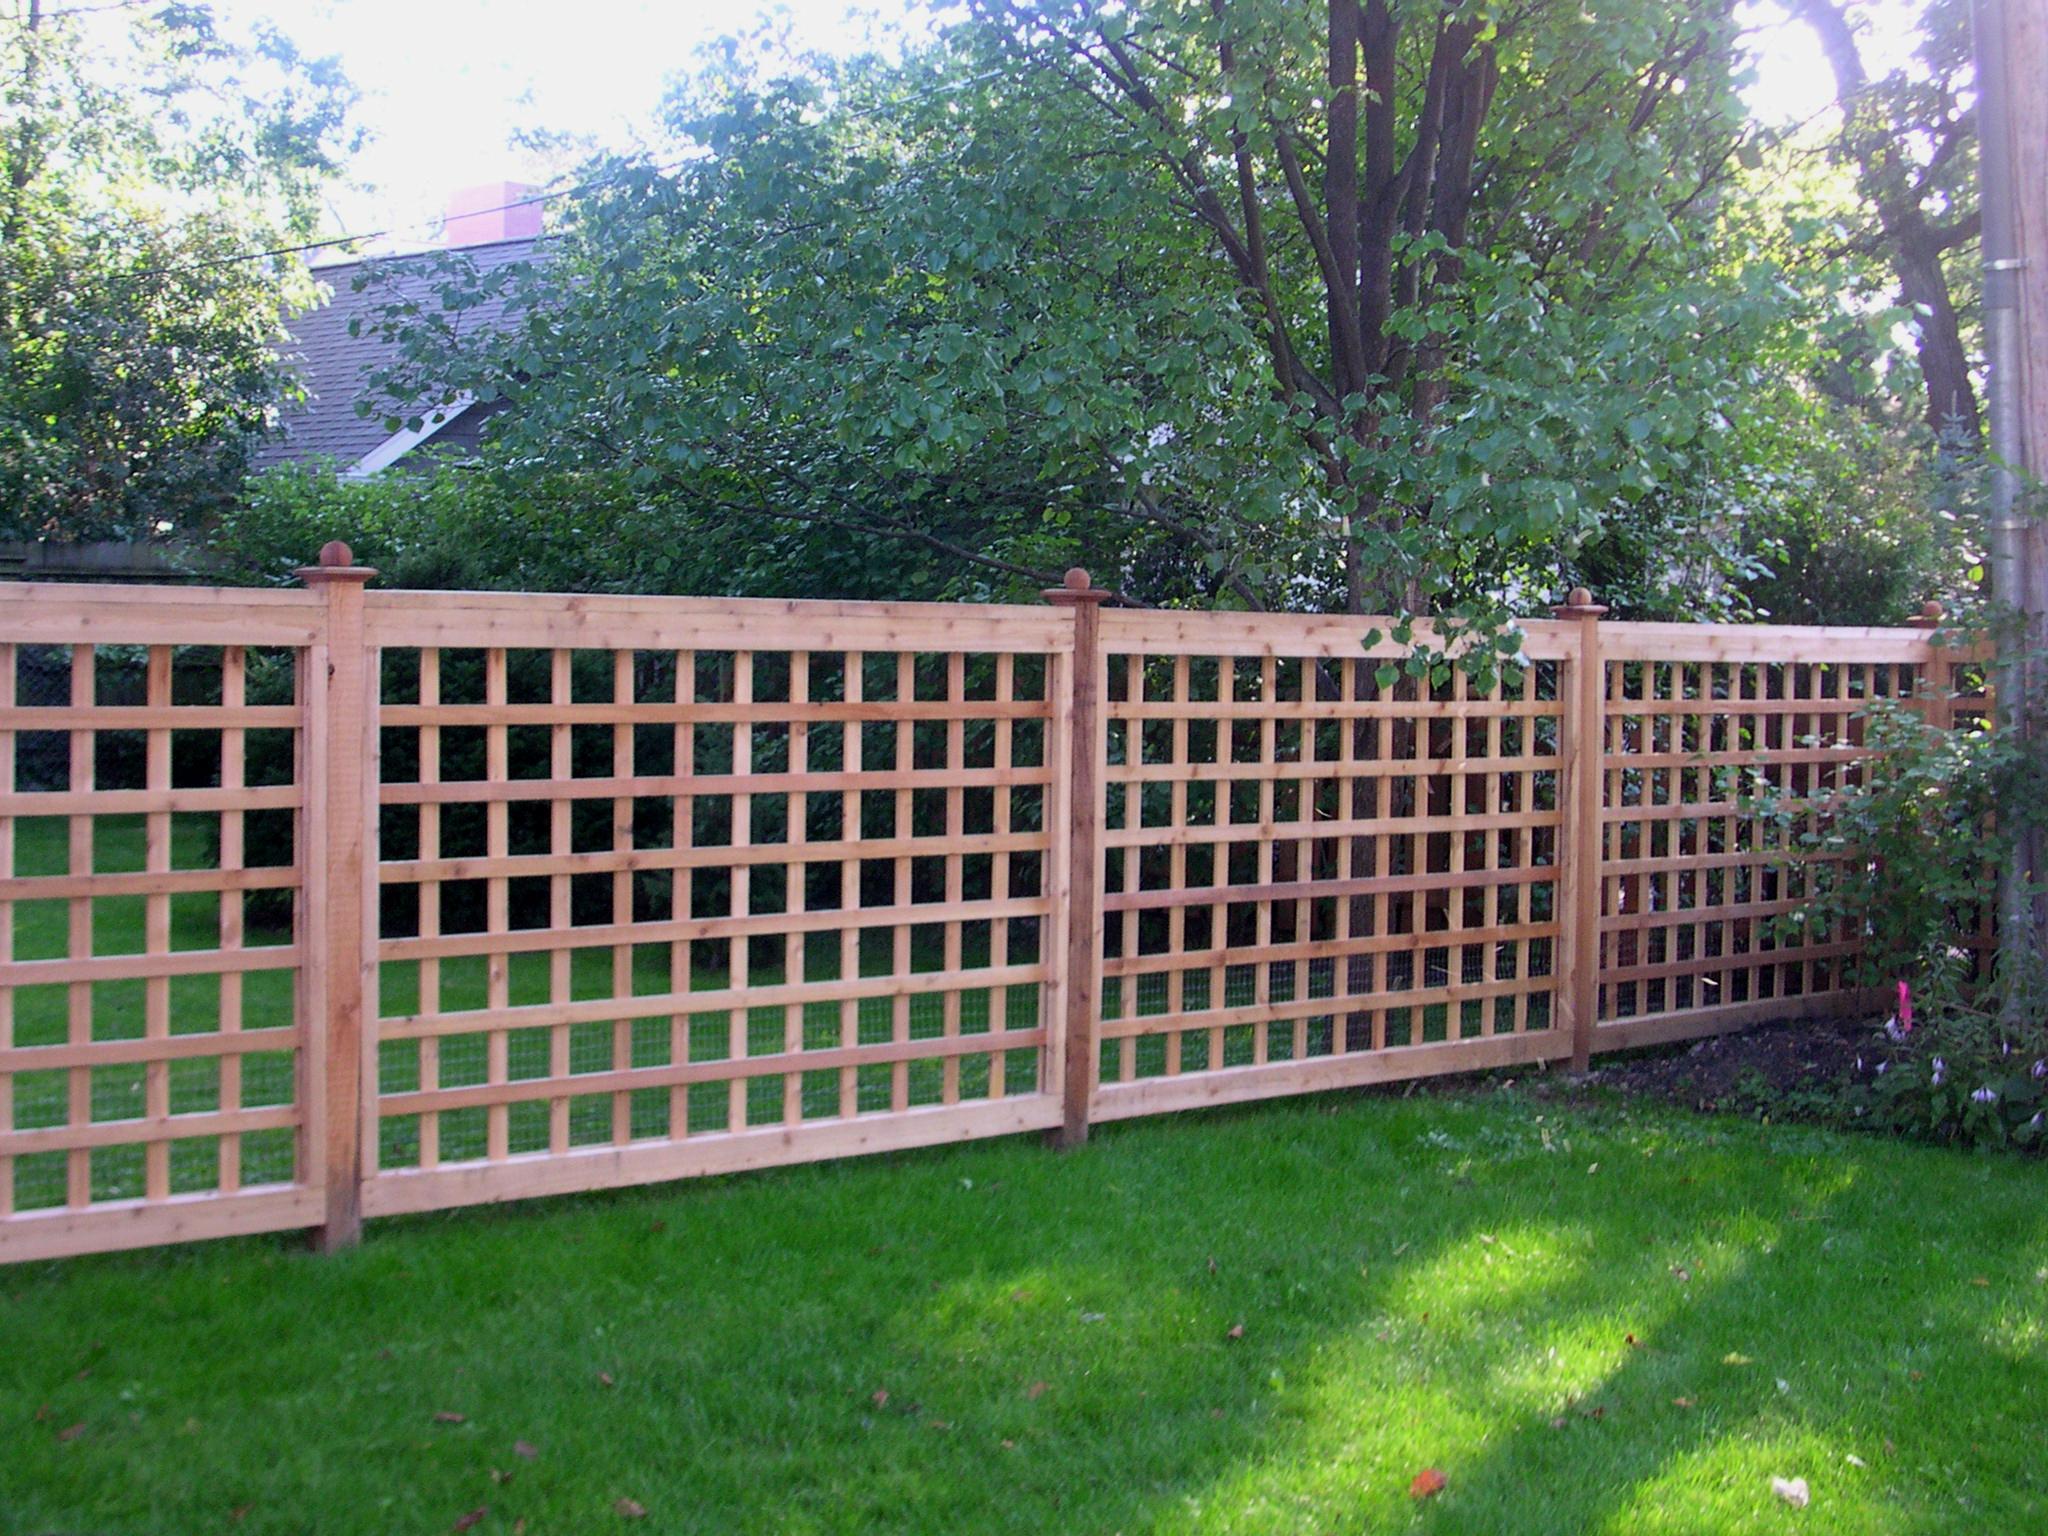 Backyard Fencing Ideas - HomesFeed on Backyard Fence Landscaping Ideas id=36205